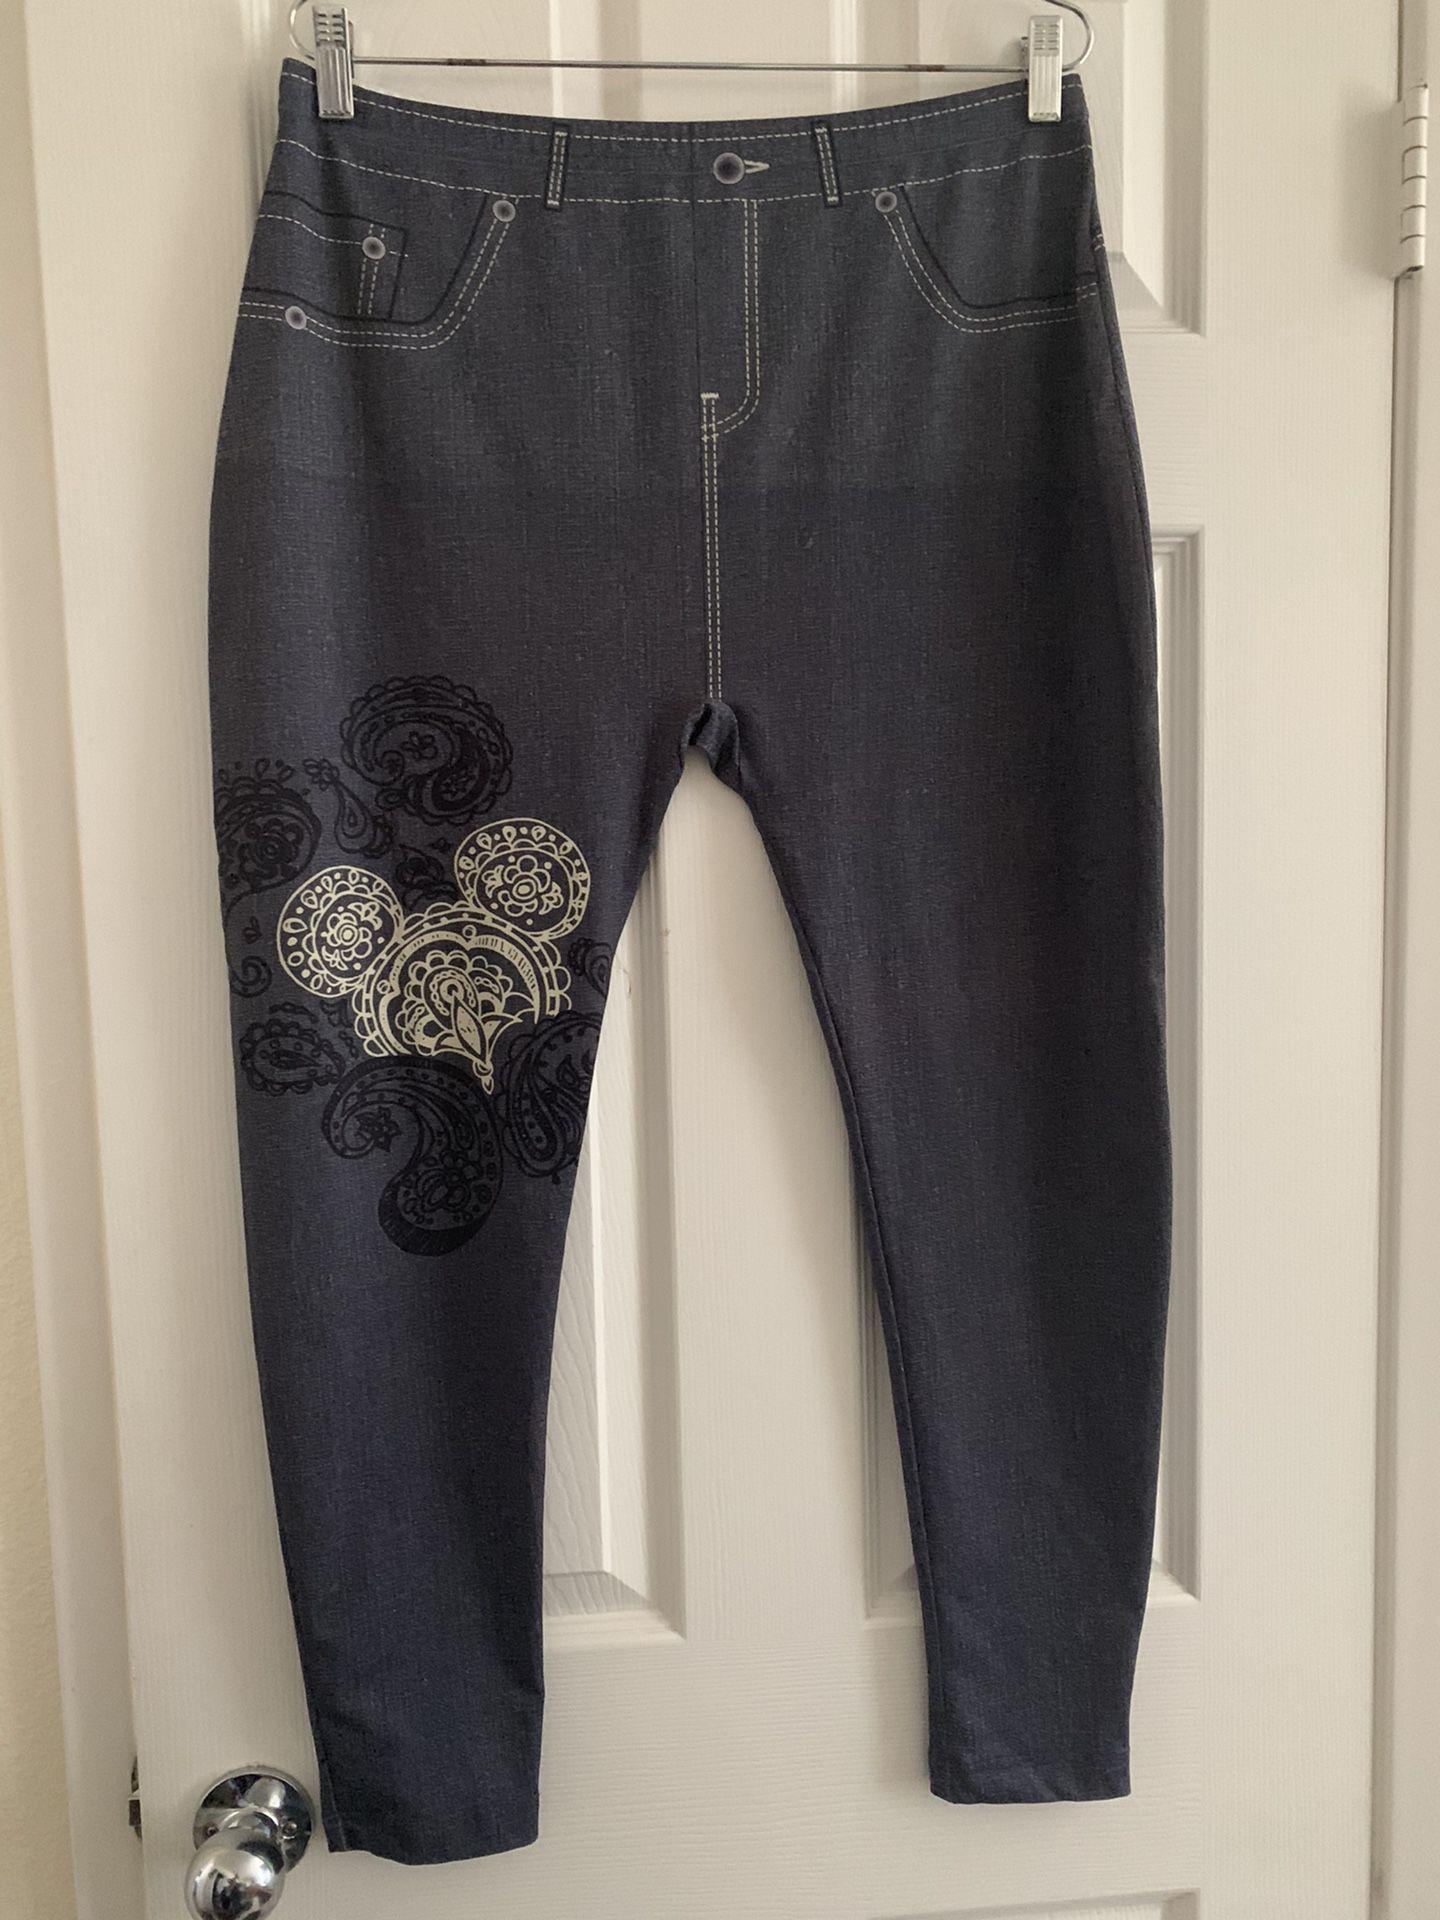 Leggings pants size L